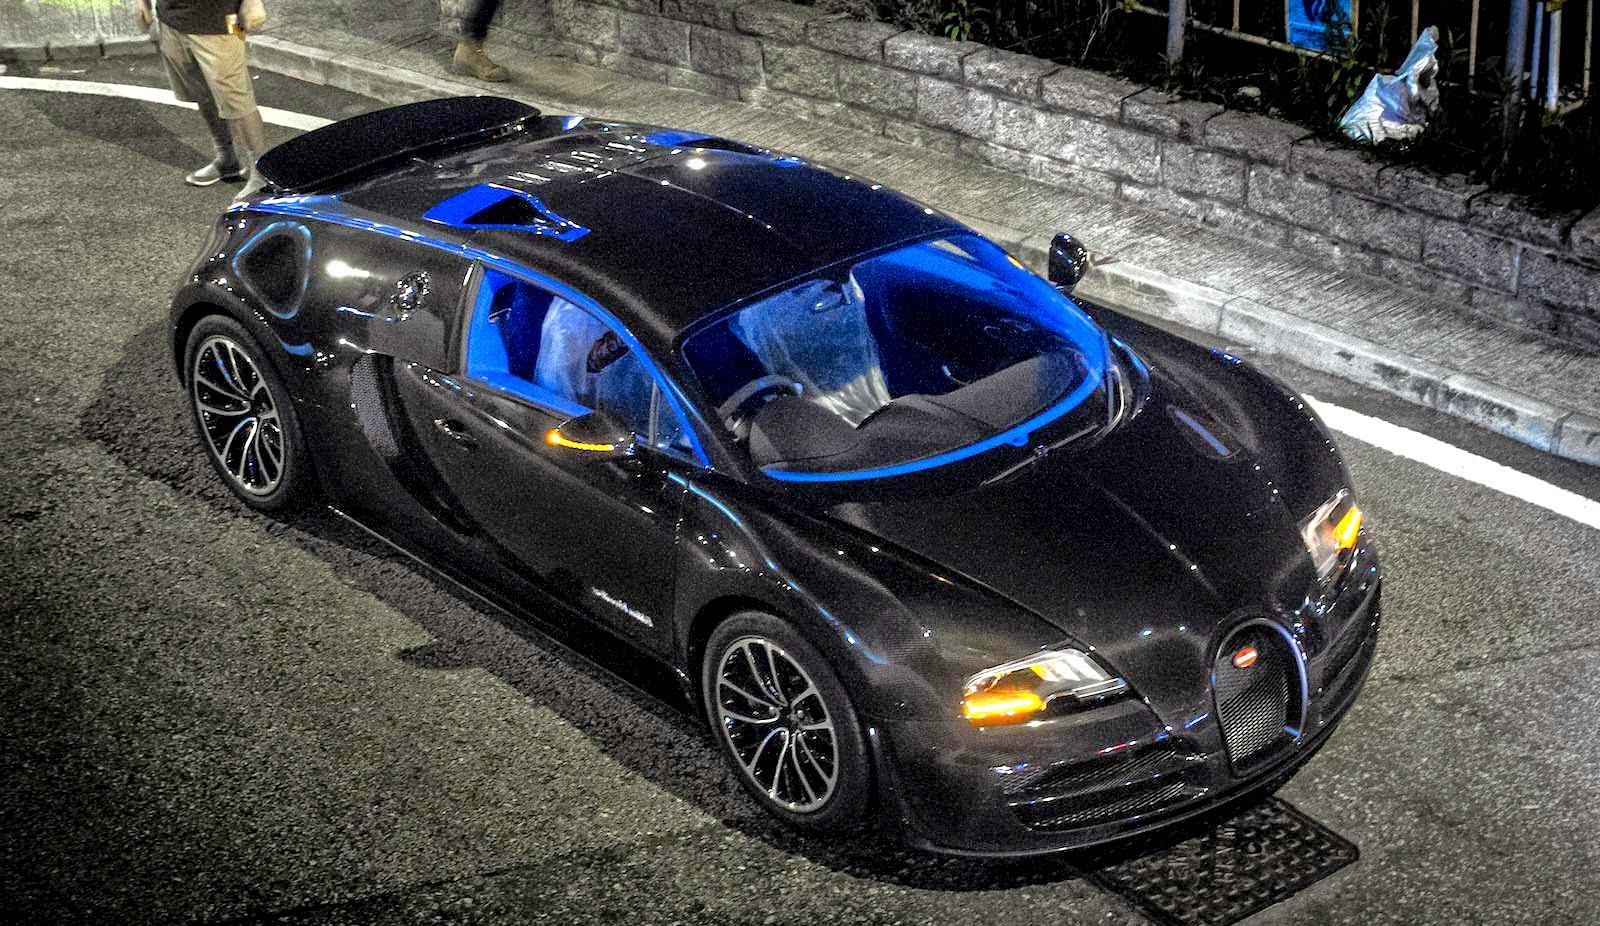 bugatti veyron super sport merveilleux edition concept. Black Bedroom Furniture Sets. Home Design Ideas